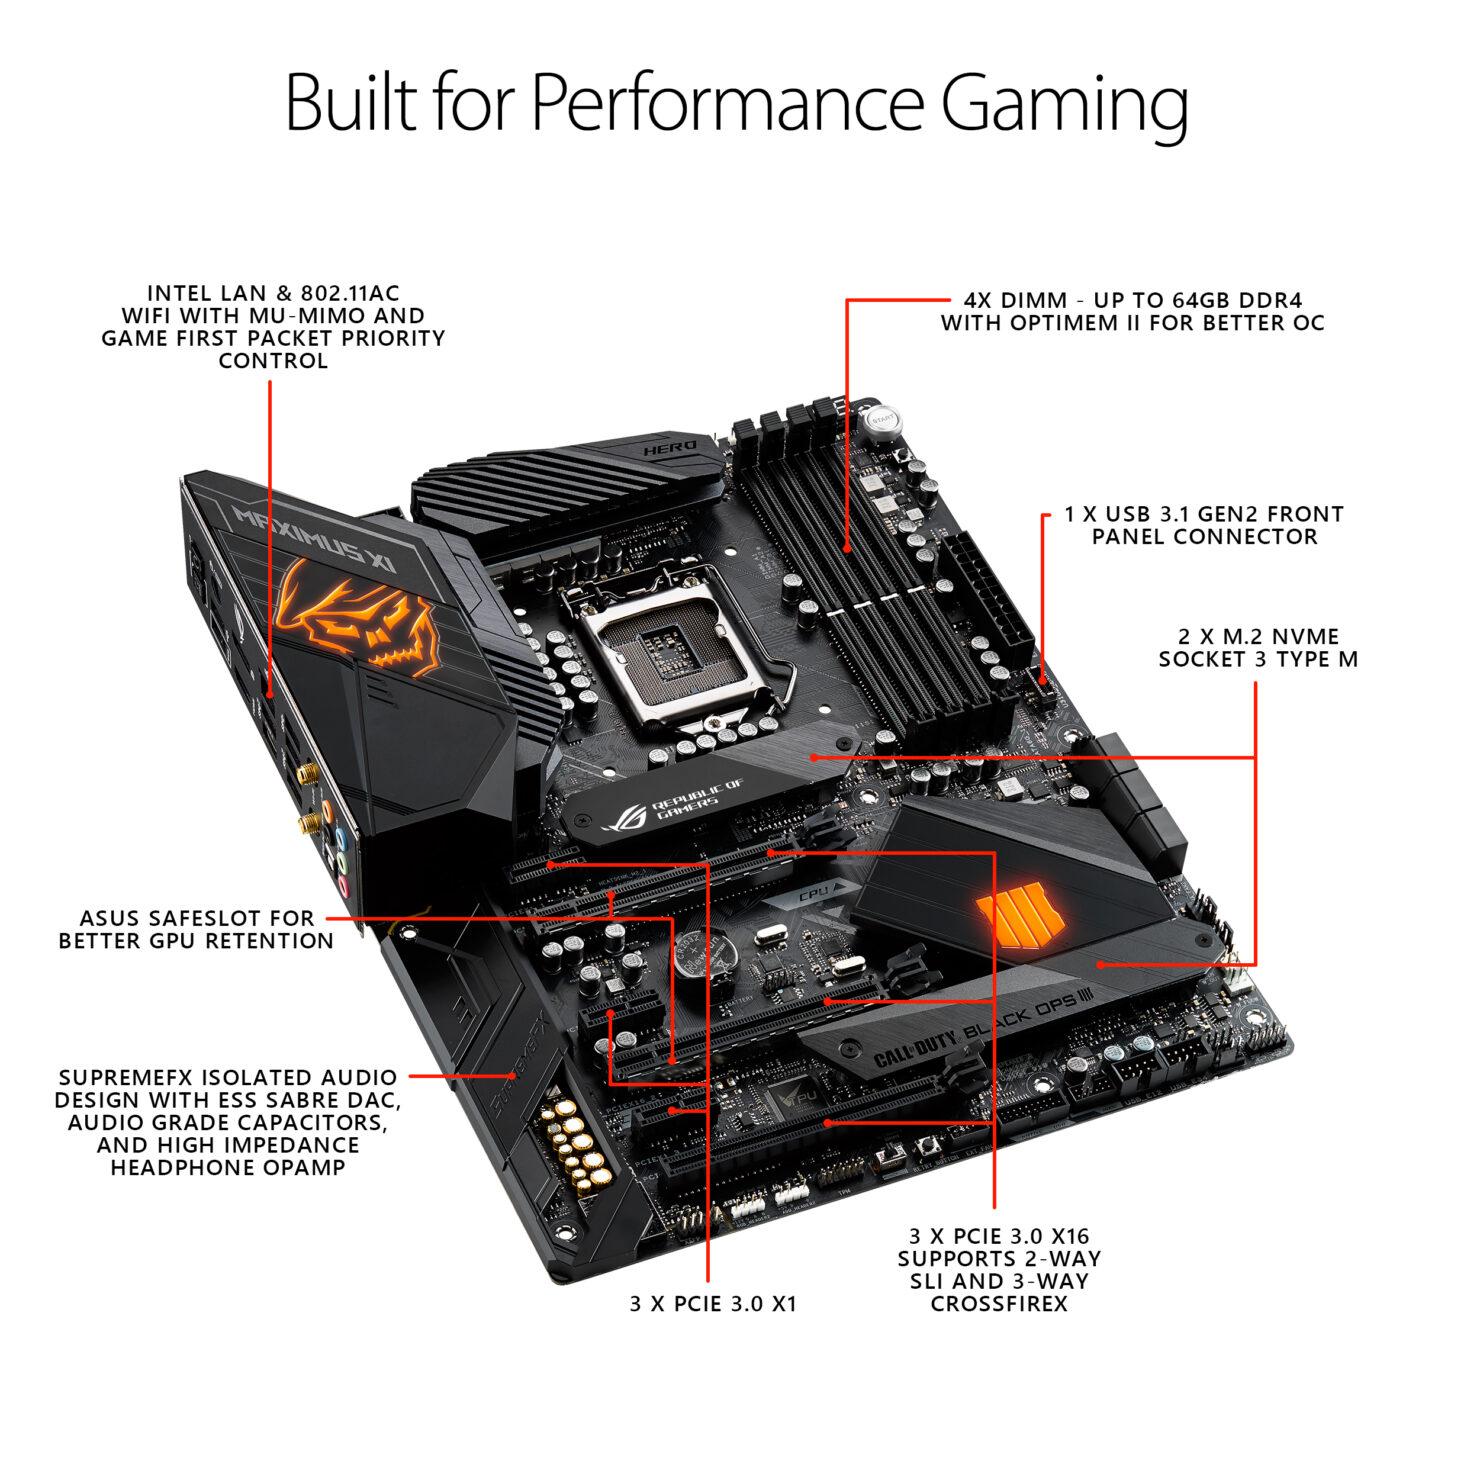 4-rog-maximus-xi-hero-wifi-ce-built-for-performance-gaming